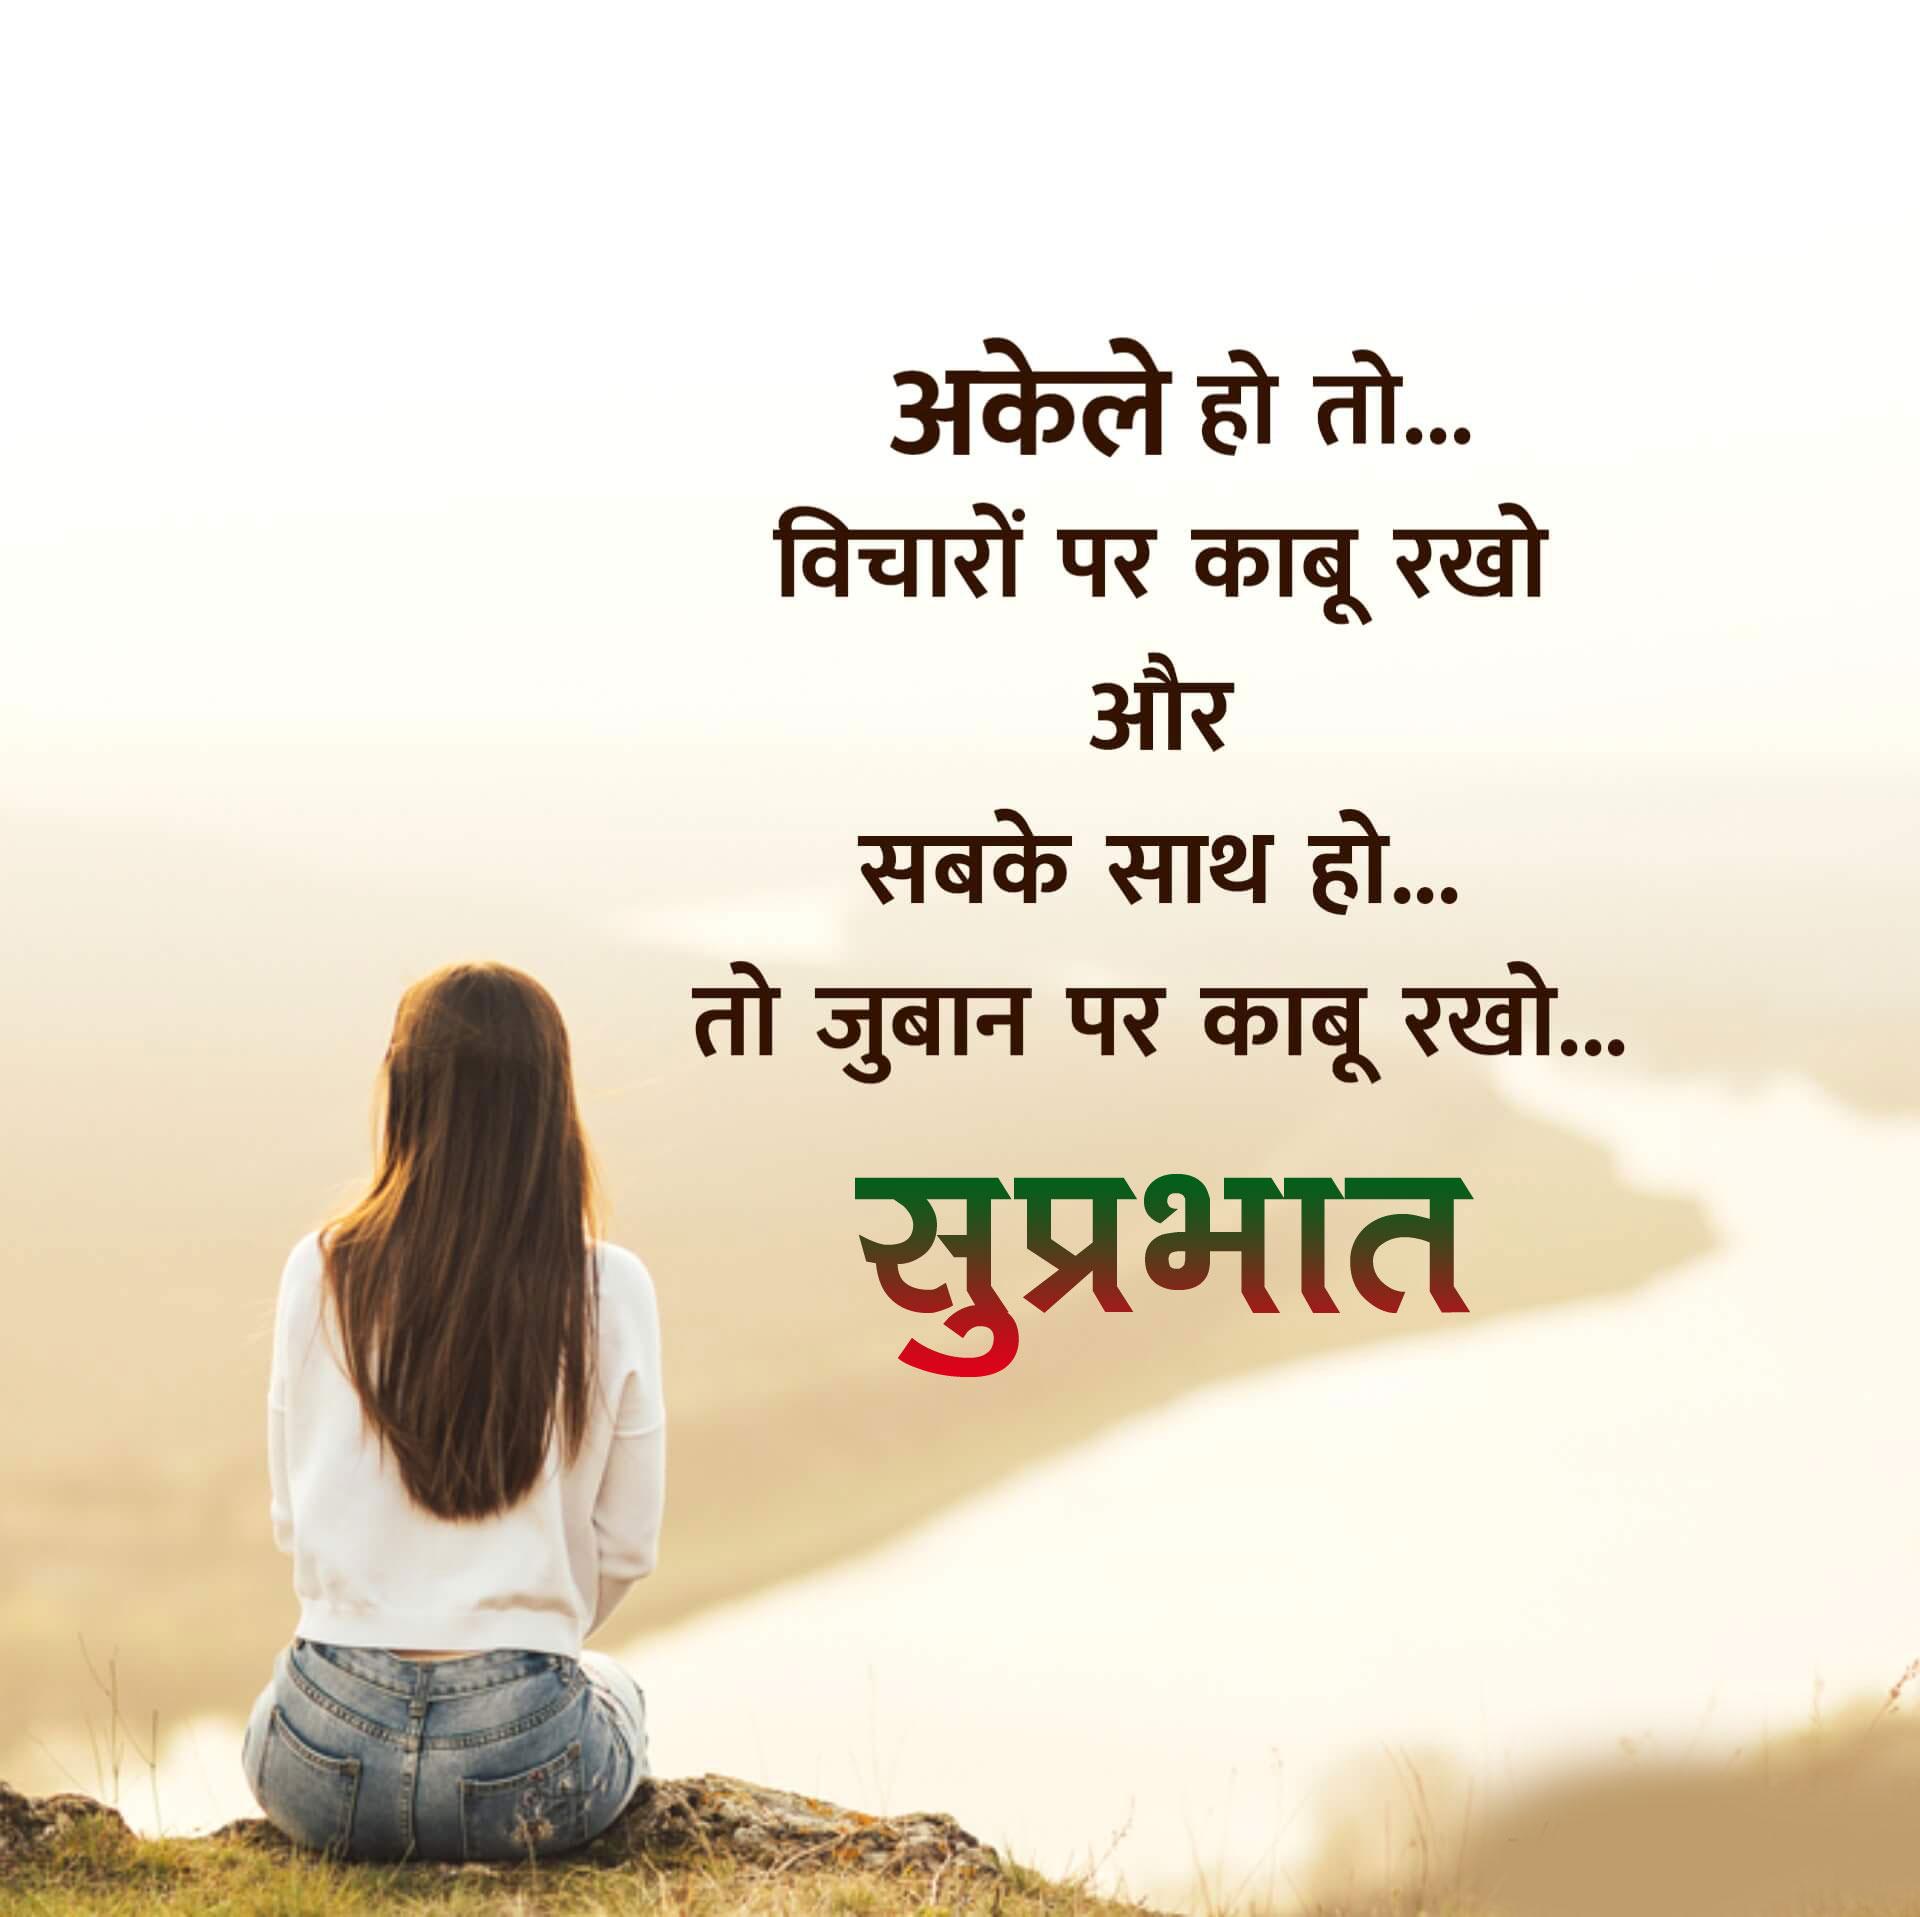 New Beautiful Suprabhat Images photo